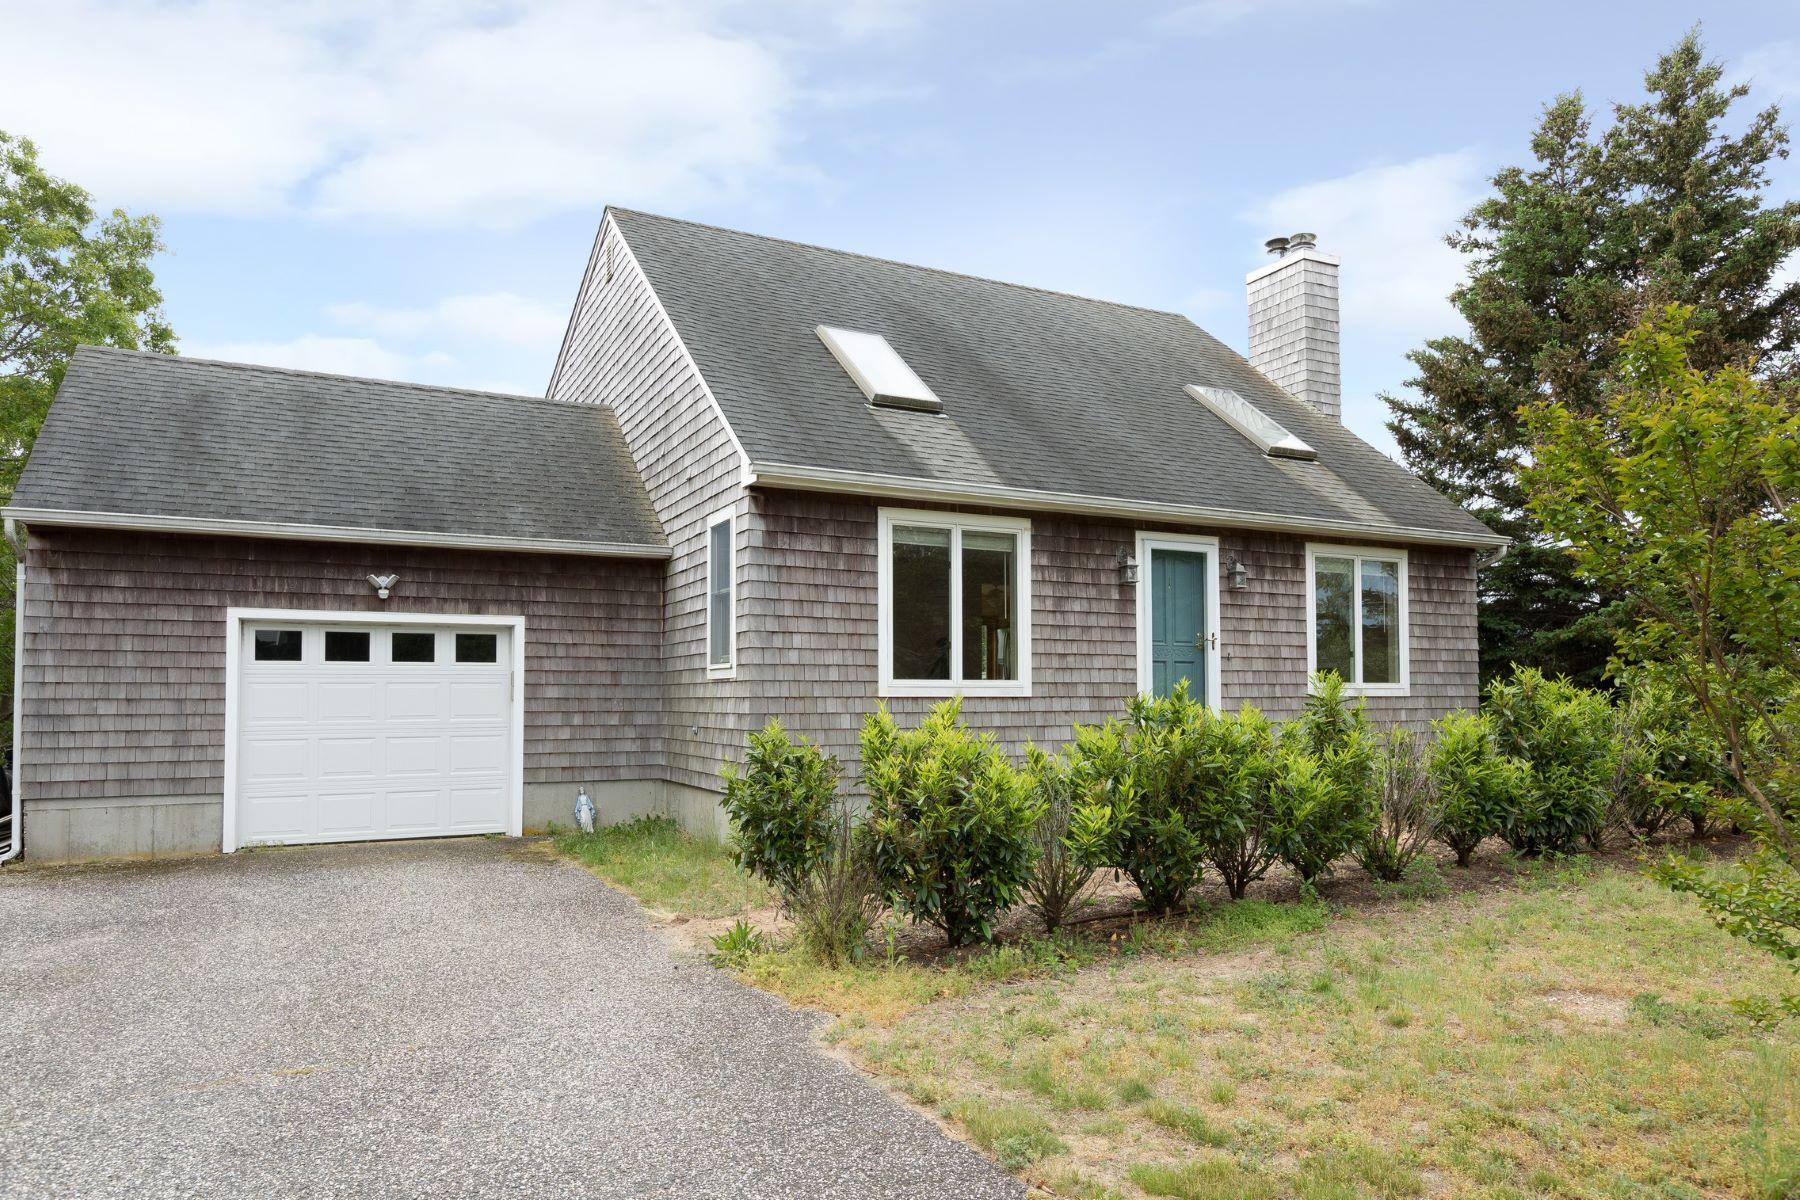 Property for Sale at Aquebogue 1 Huckleberry Hill Hl Aquebogue, New York 11931 United States